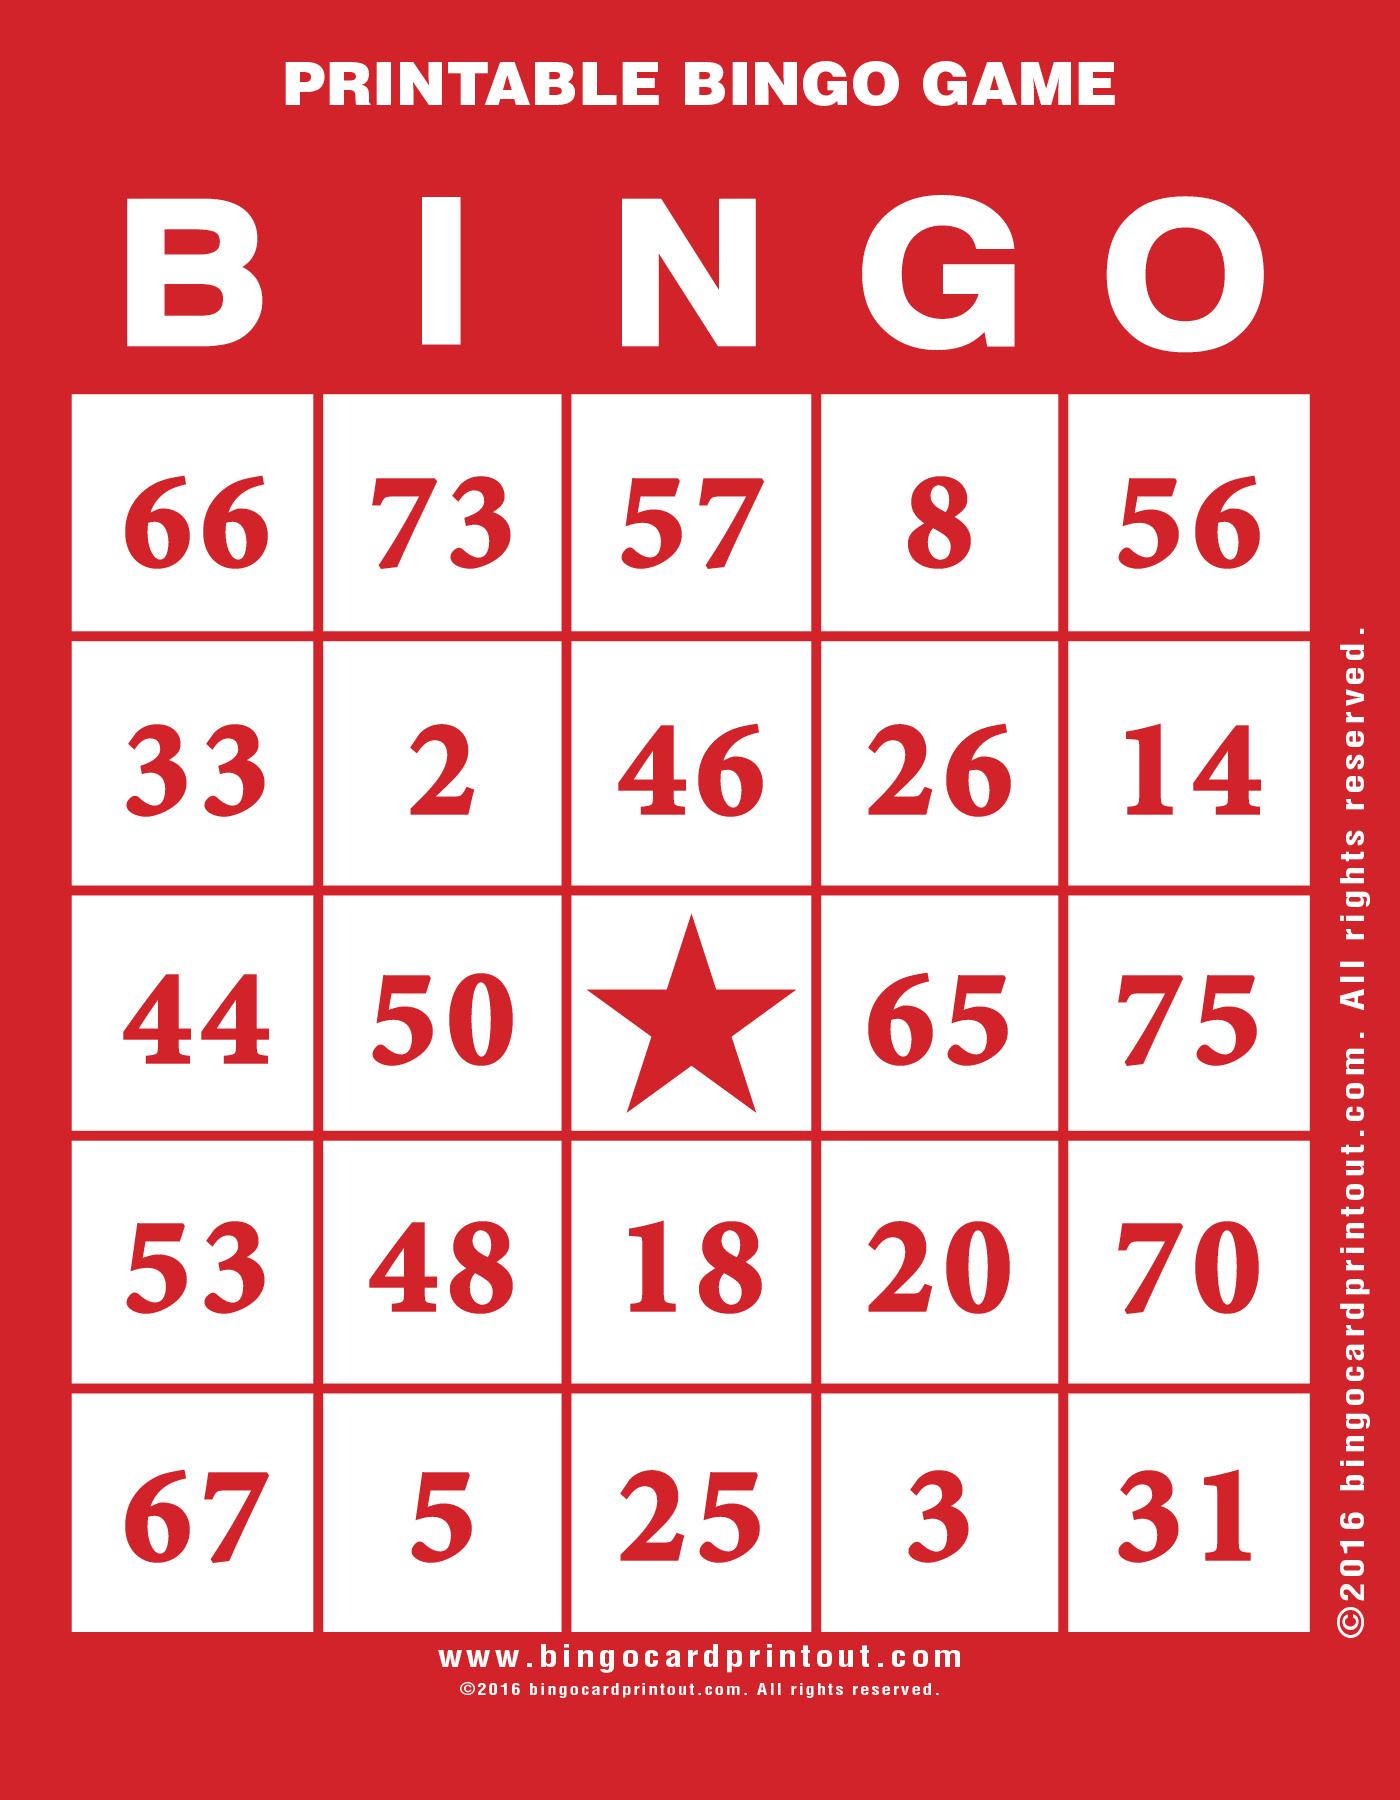 Printable Bingo Game - Bingocardprintout